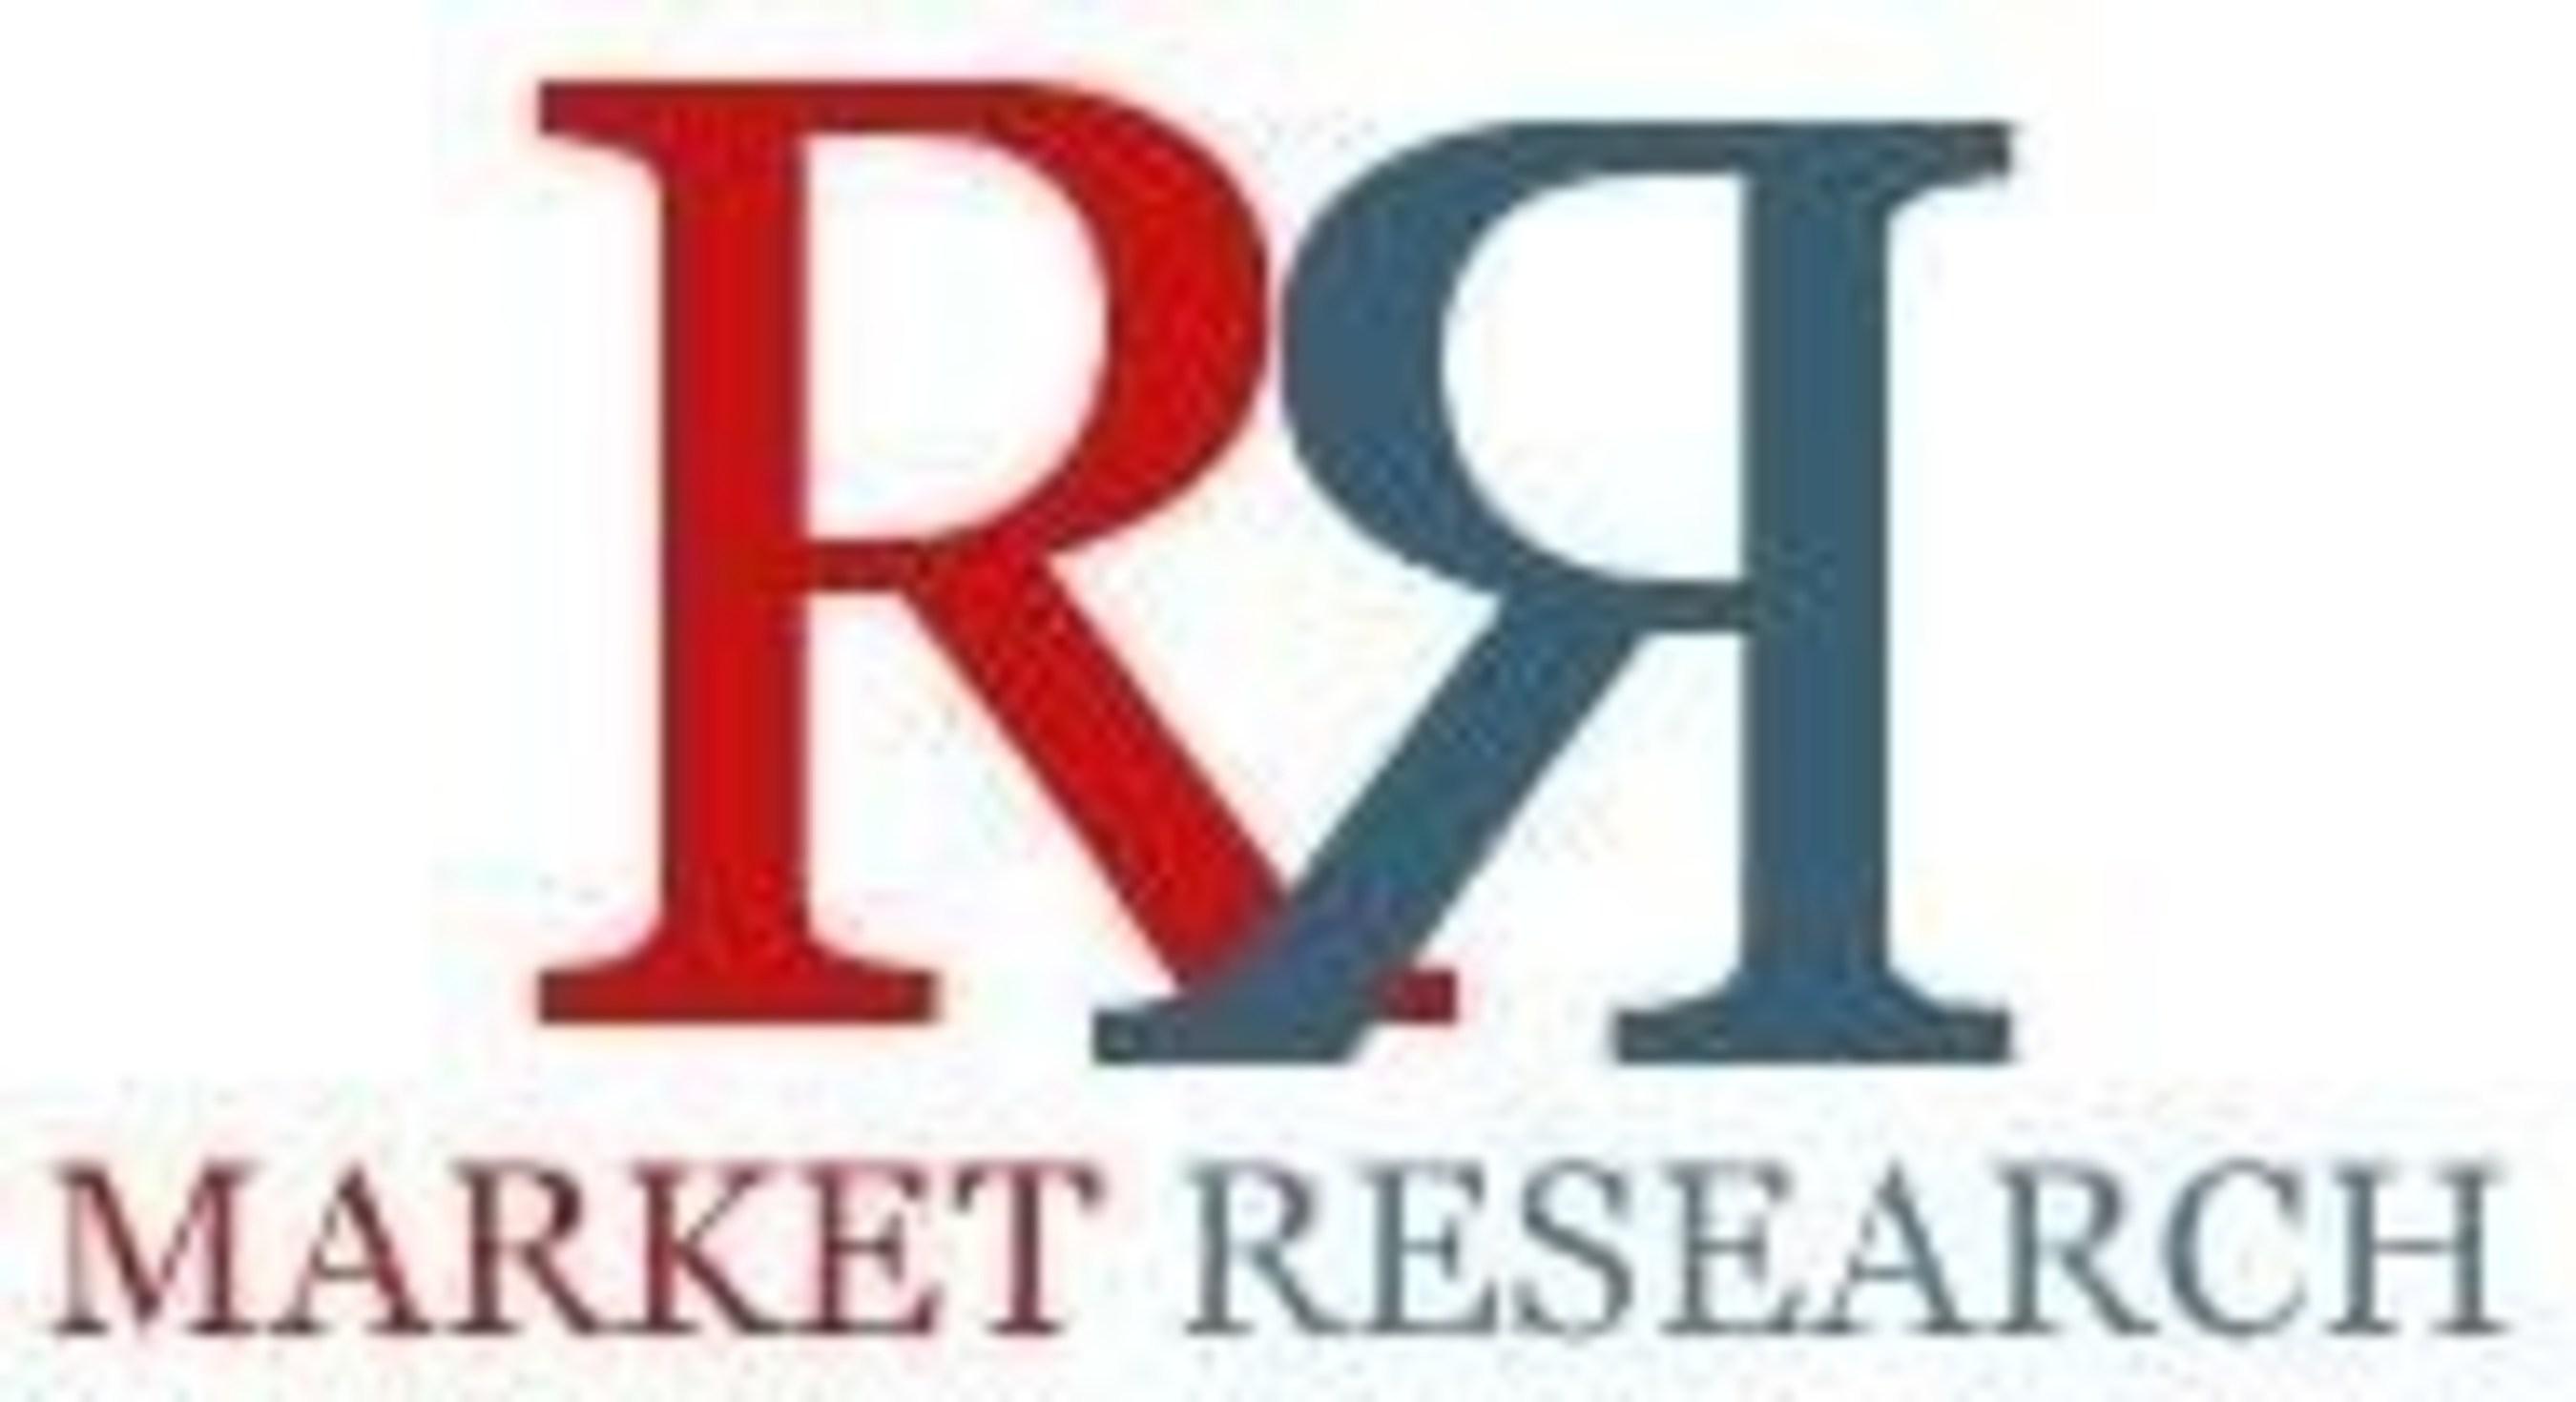 ADAS Camera Market 2020 Key Manufacturers Magna, Clarion, TRW